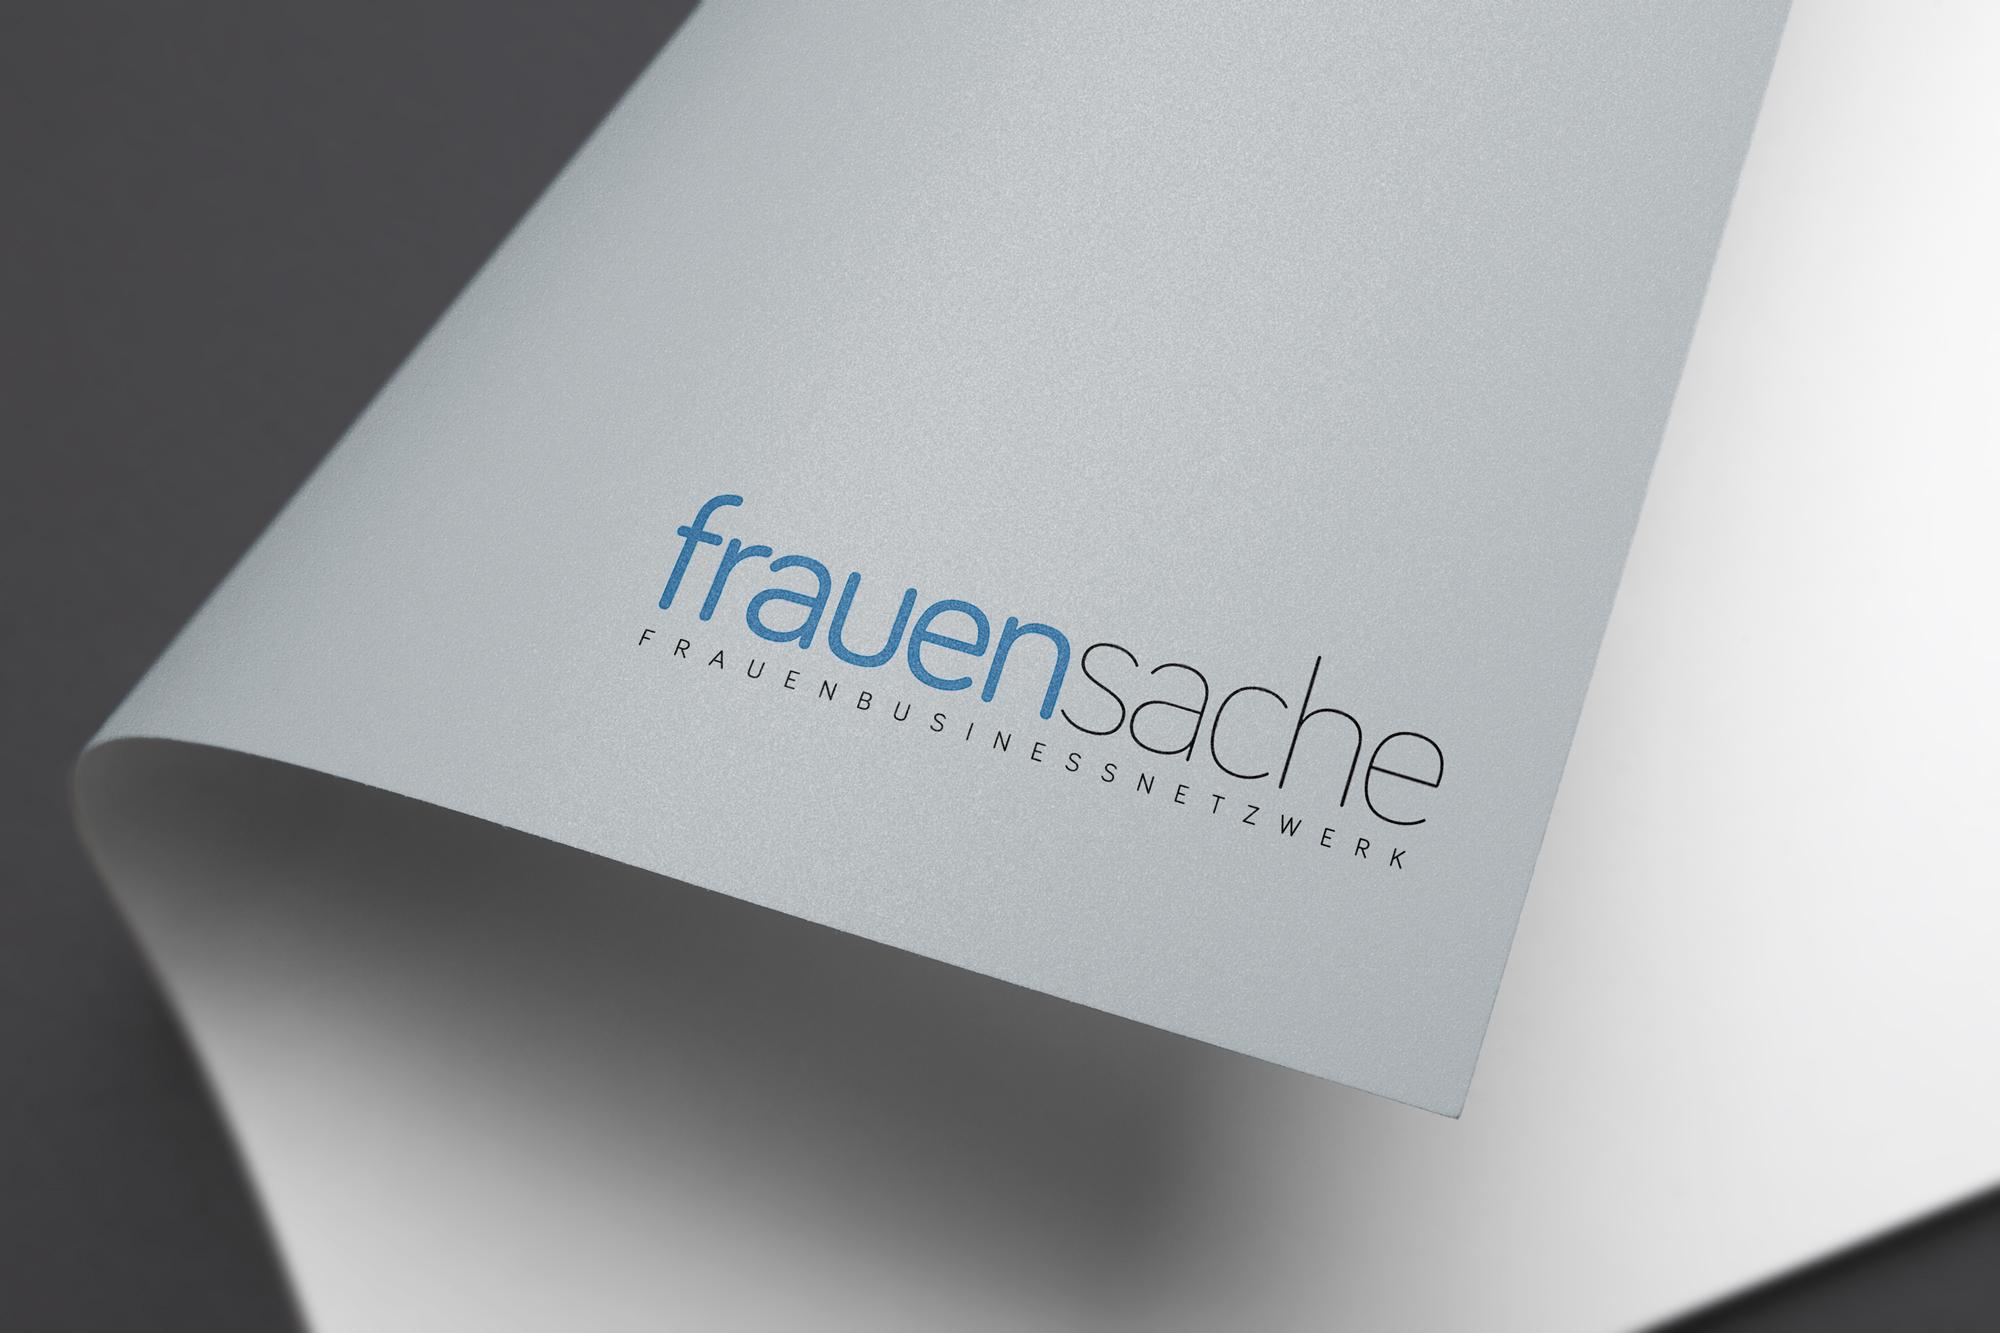 Frauensache_Logo